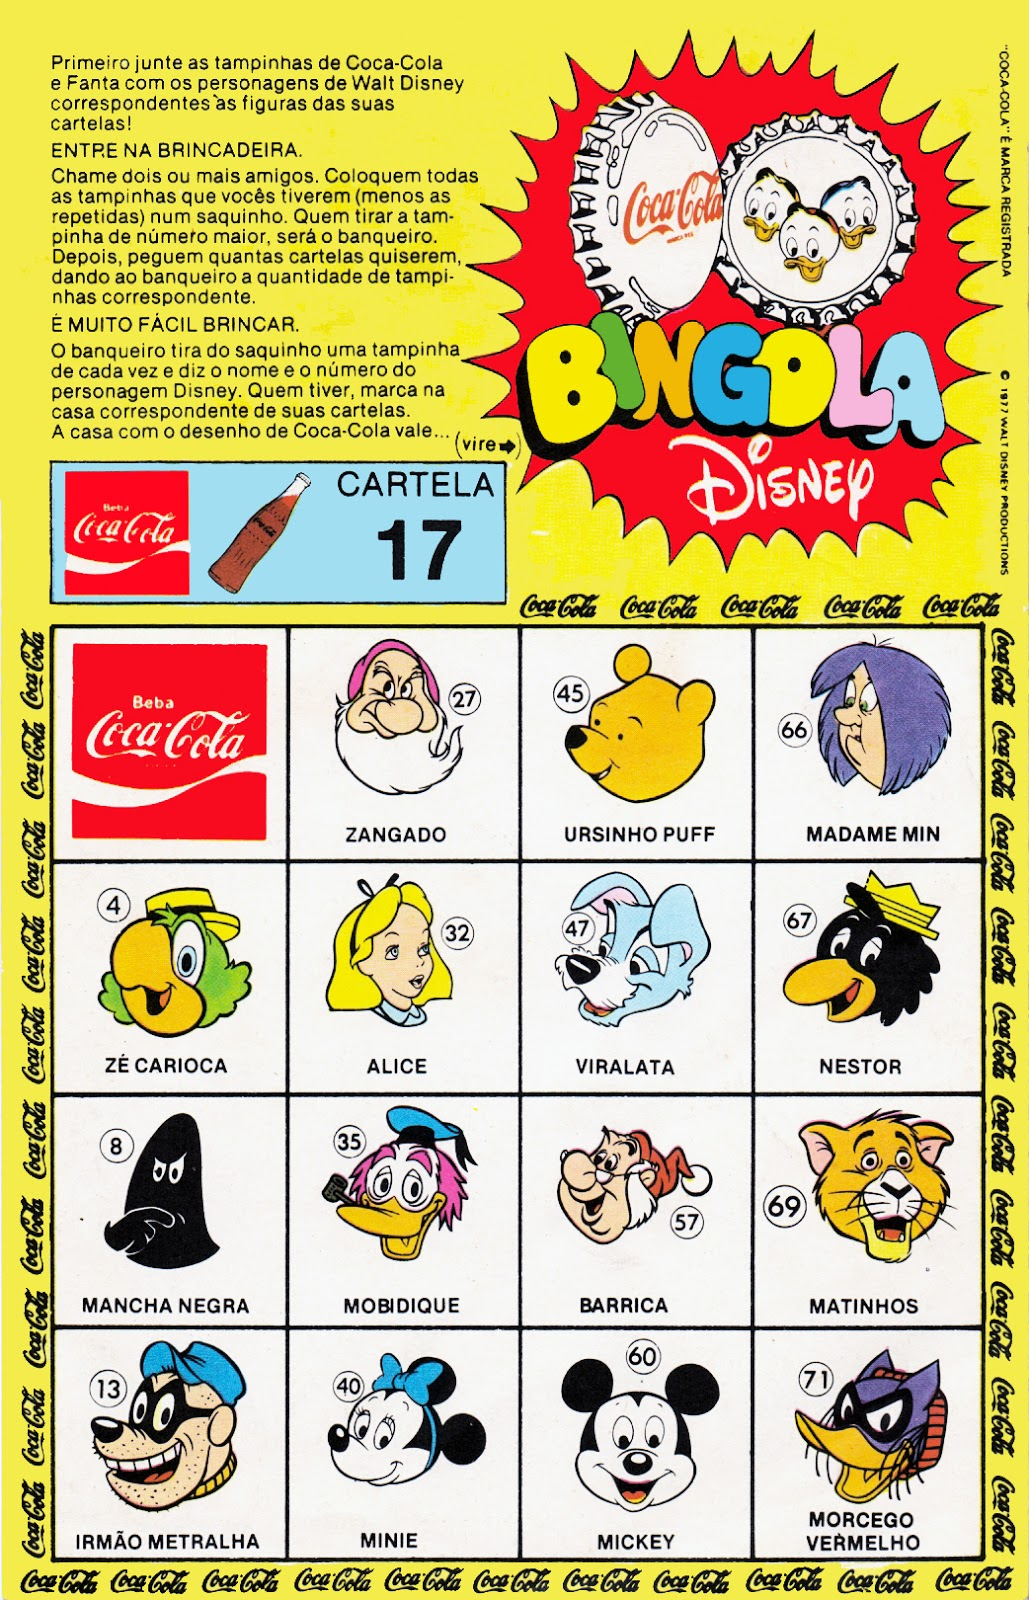 Colabingo: Coca-Cola Bingola Disney 1977